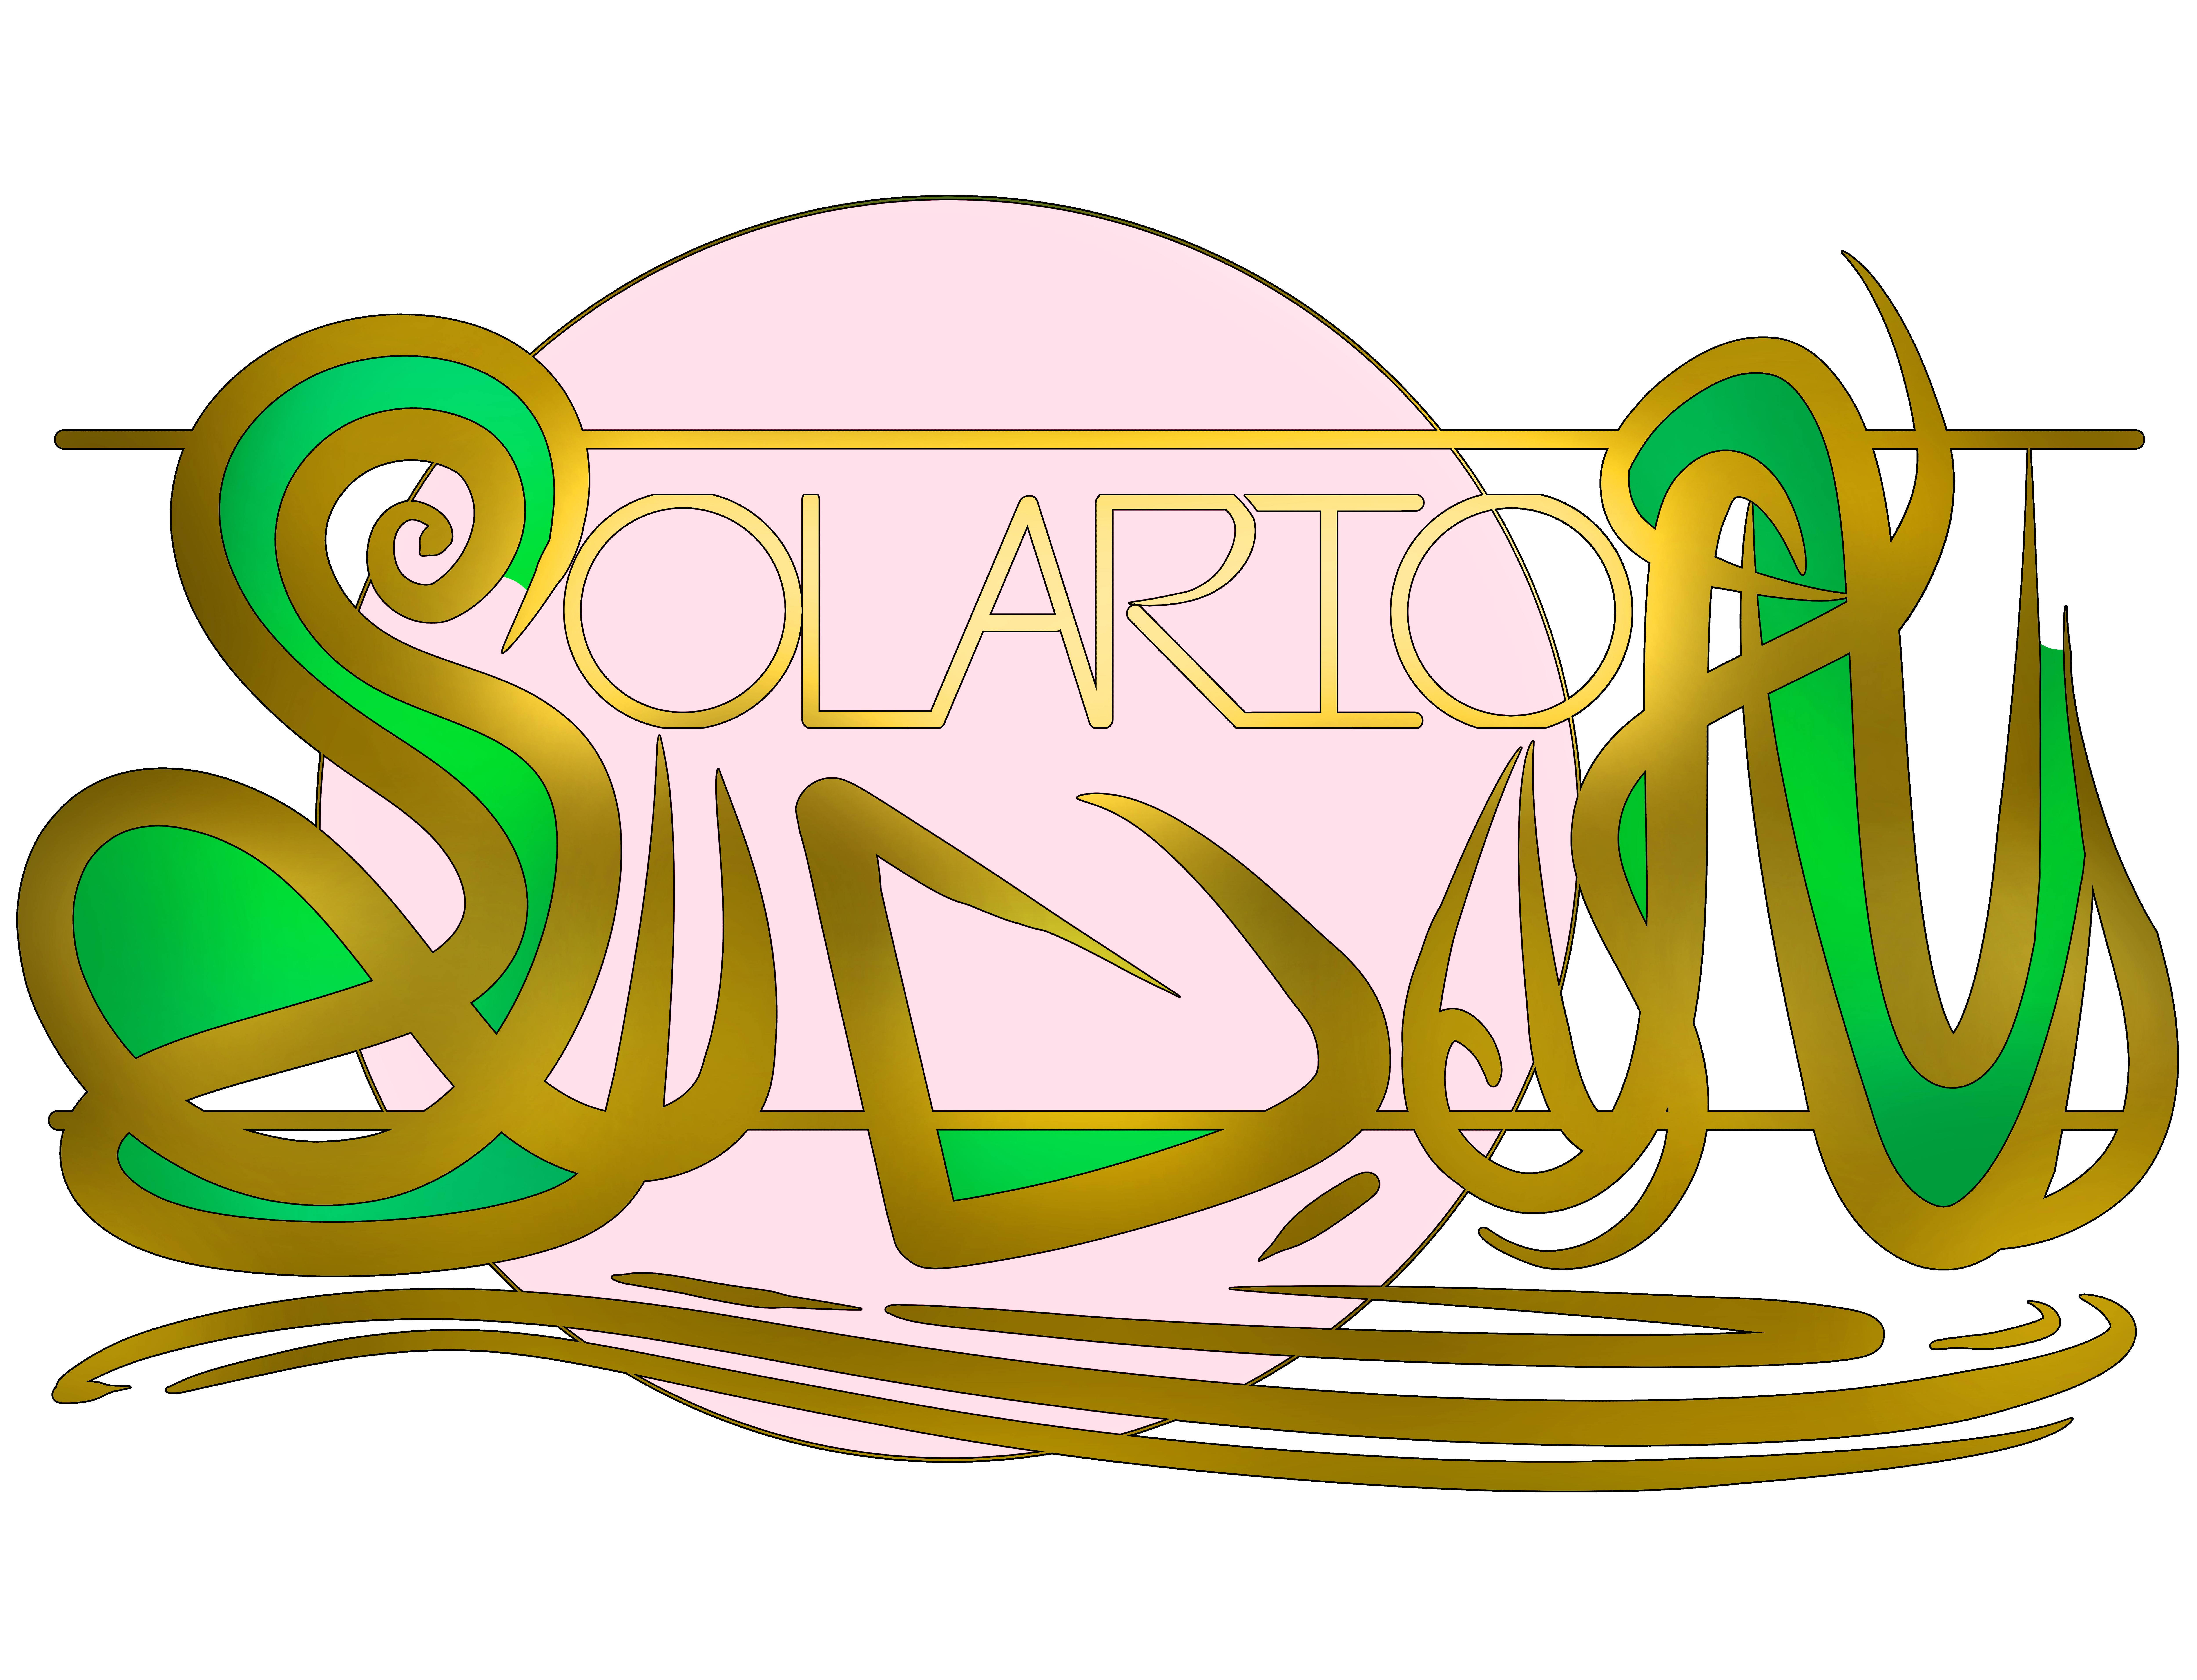 Solarion Sun